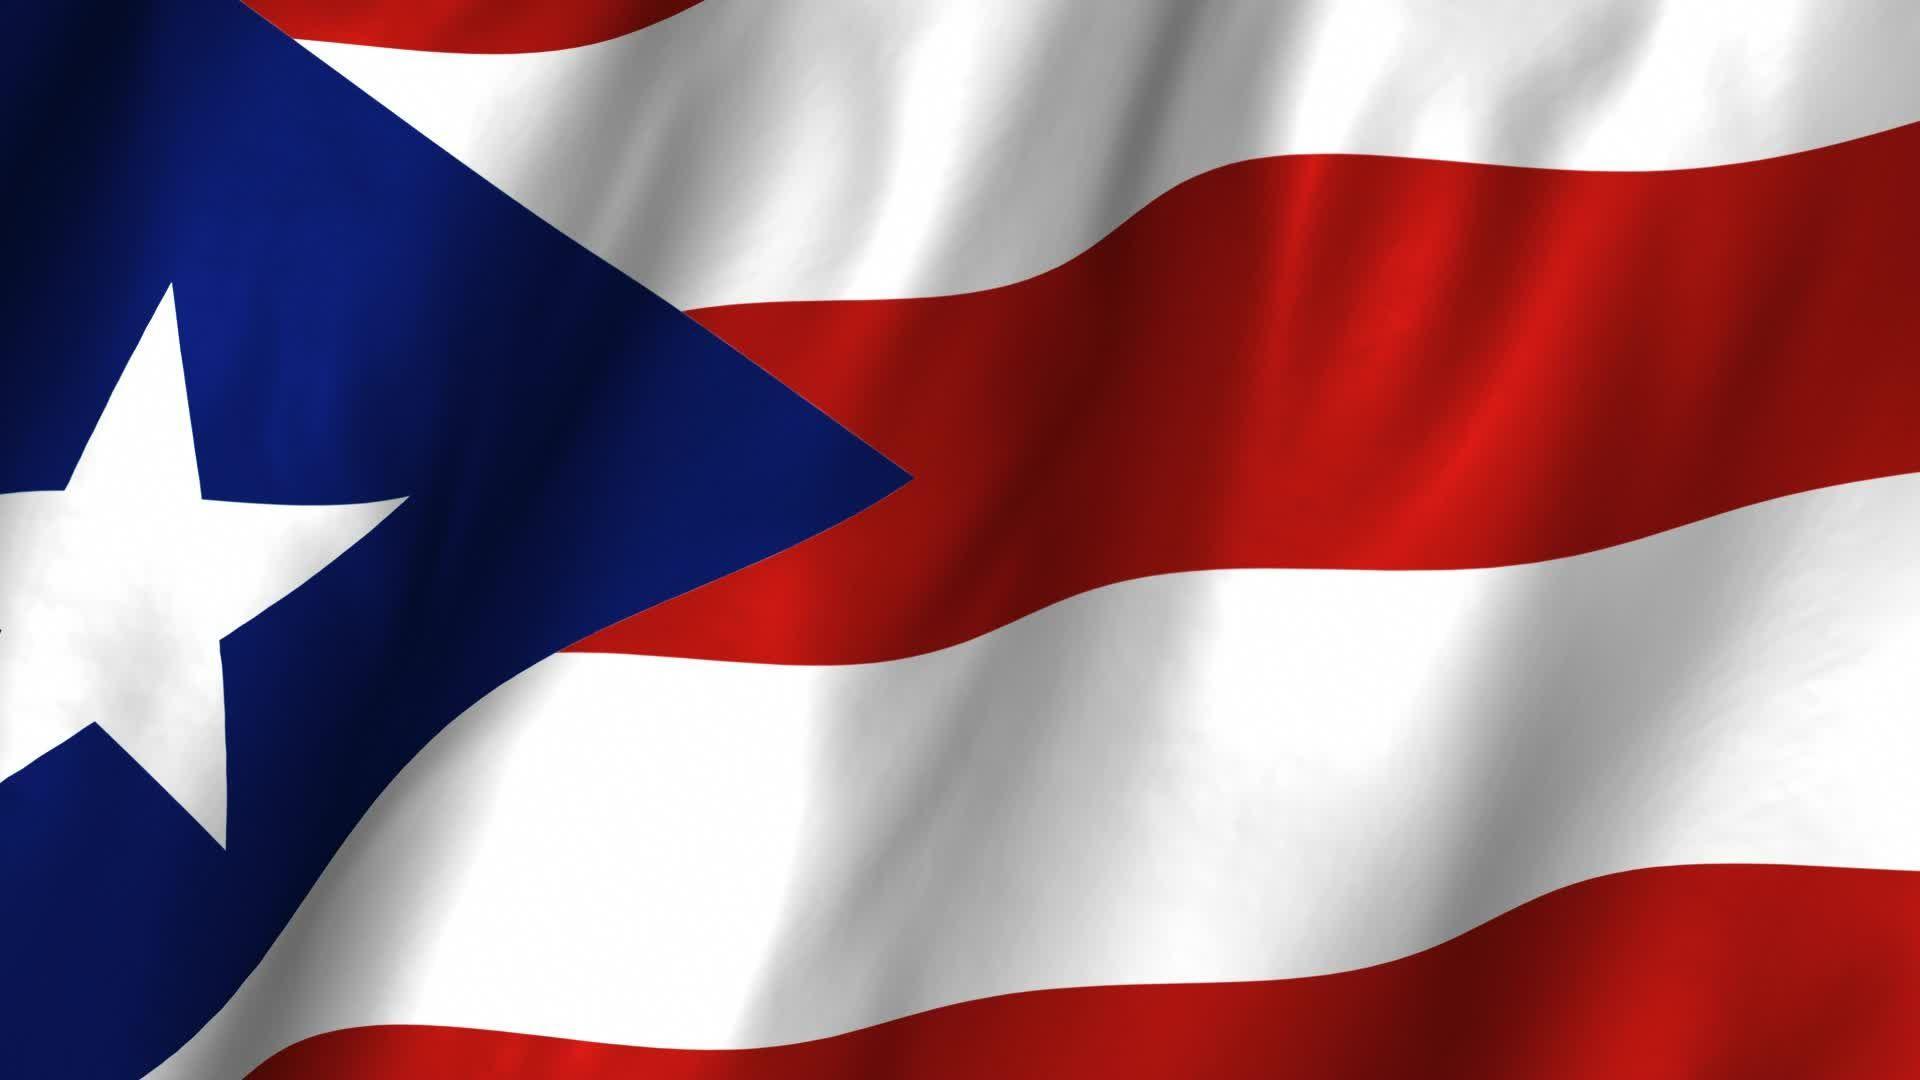 Bandera Puerto Rico Vector Wallpapers Wallpaper Cave